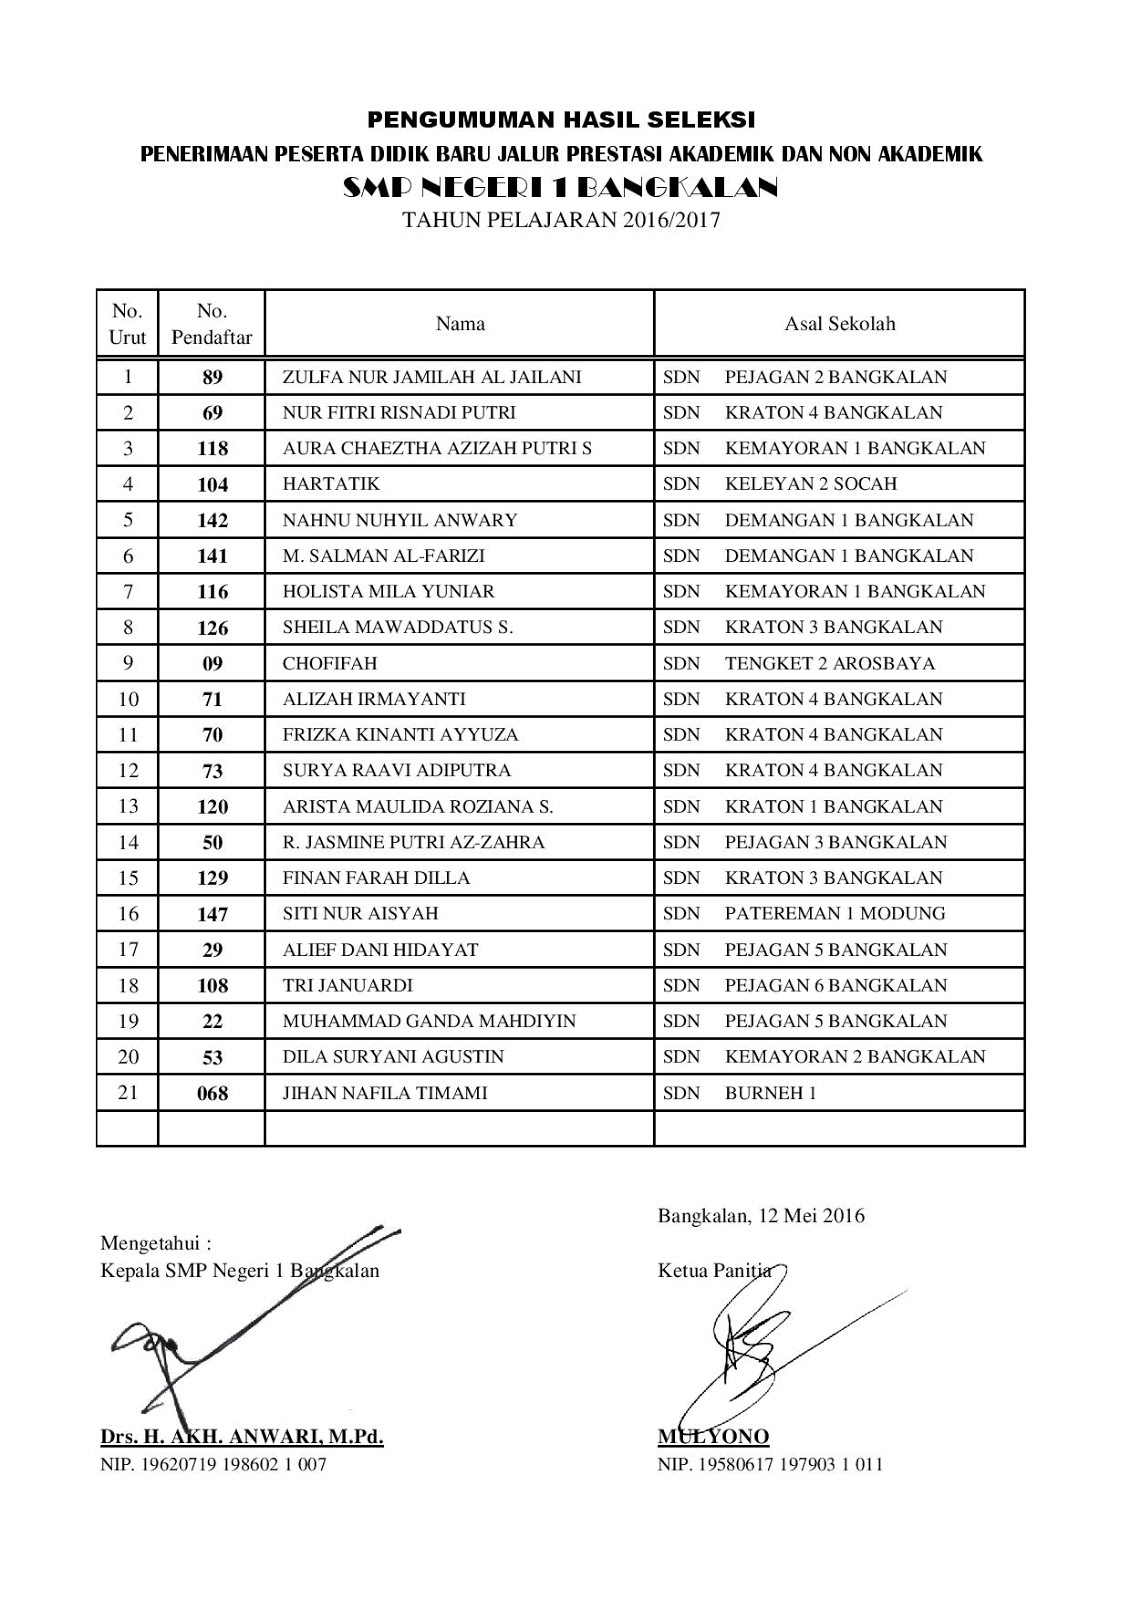 Uptd Smp Negeri 1 Bangkalan Pengumuman Daftar Ulang